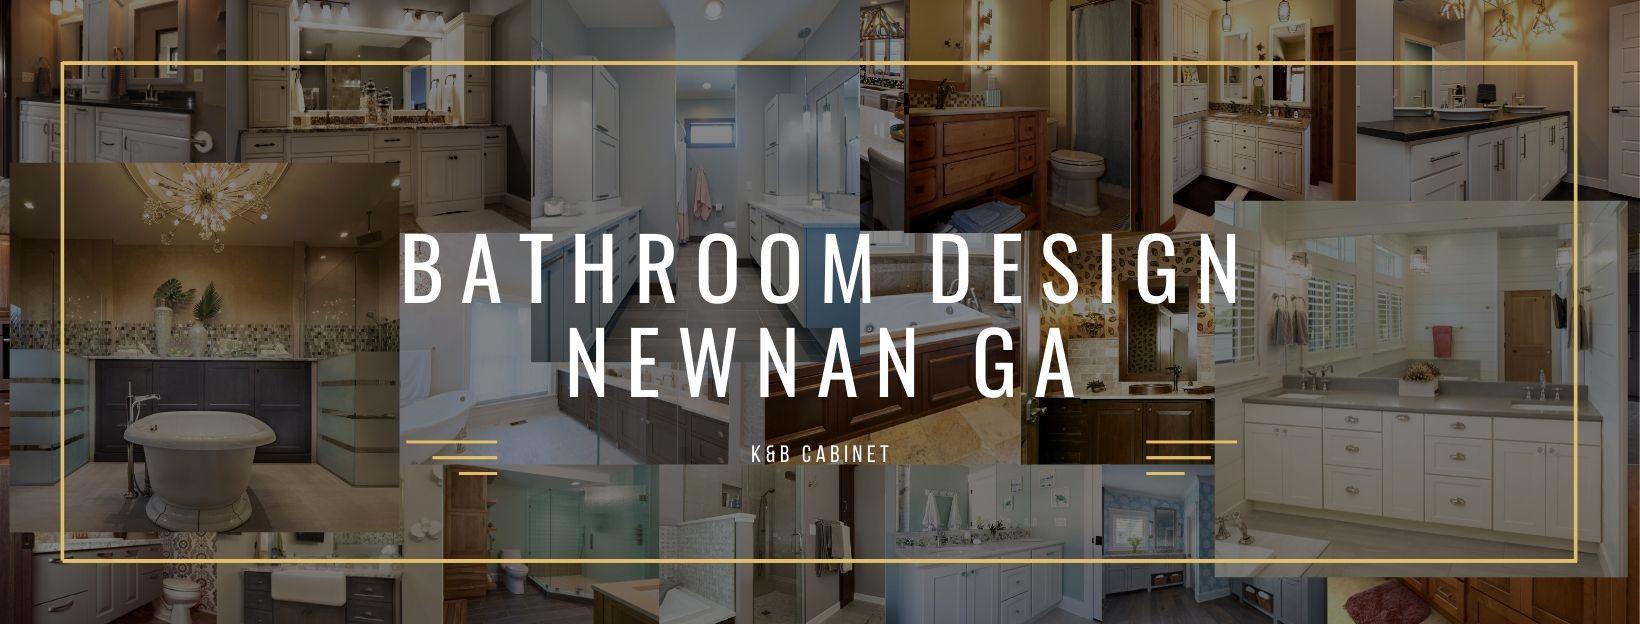 Bathroom Design Newnan GA